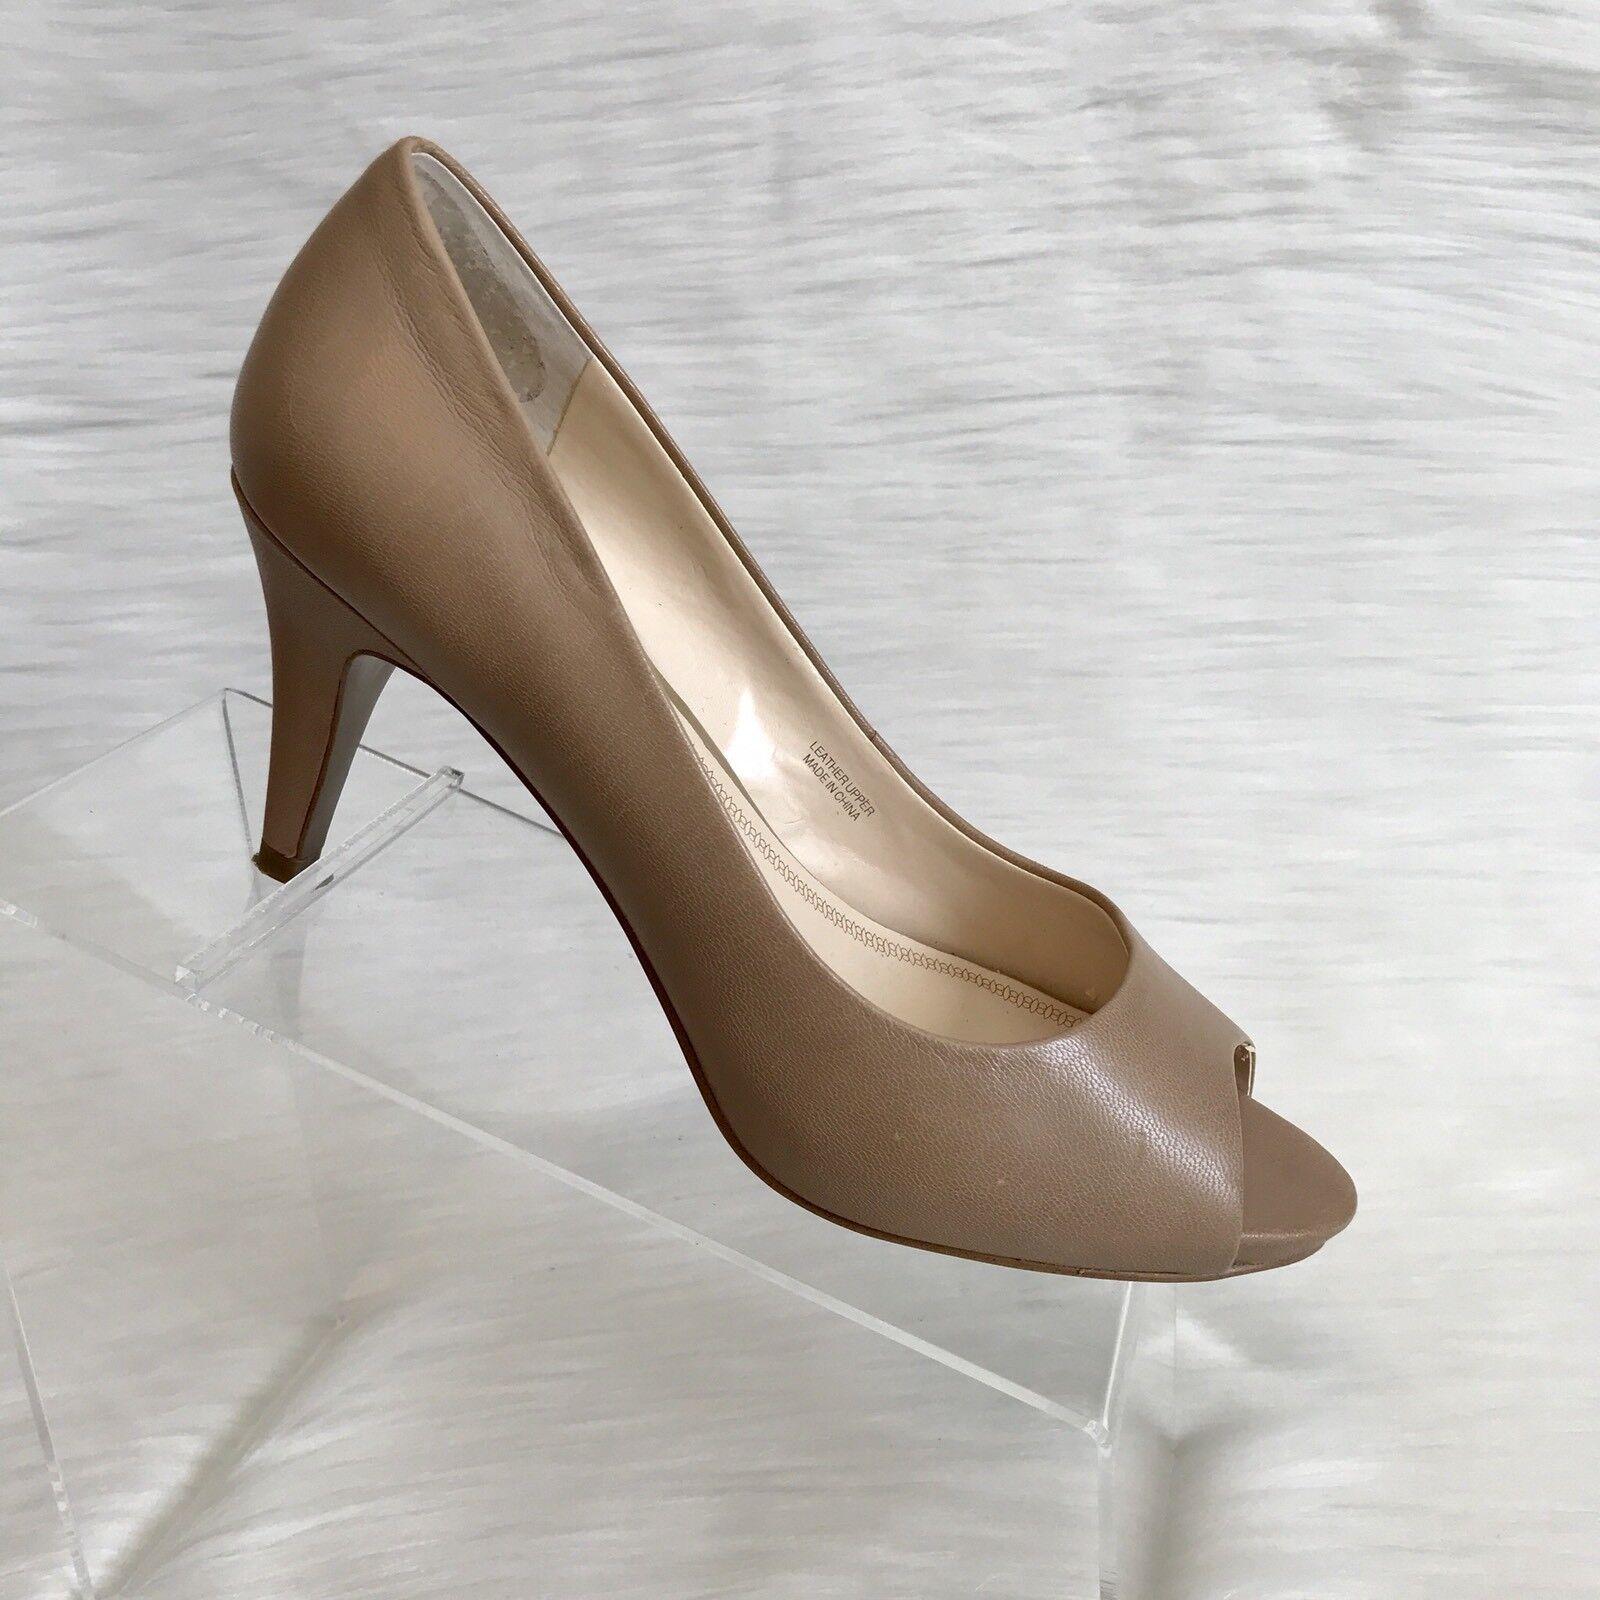 Tahari women's pumps size 8 M Tan Leather  Peep Toe Heels